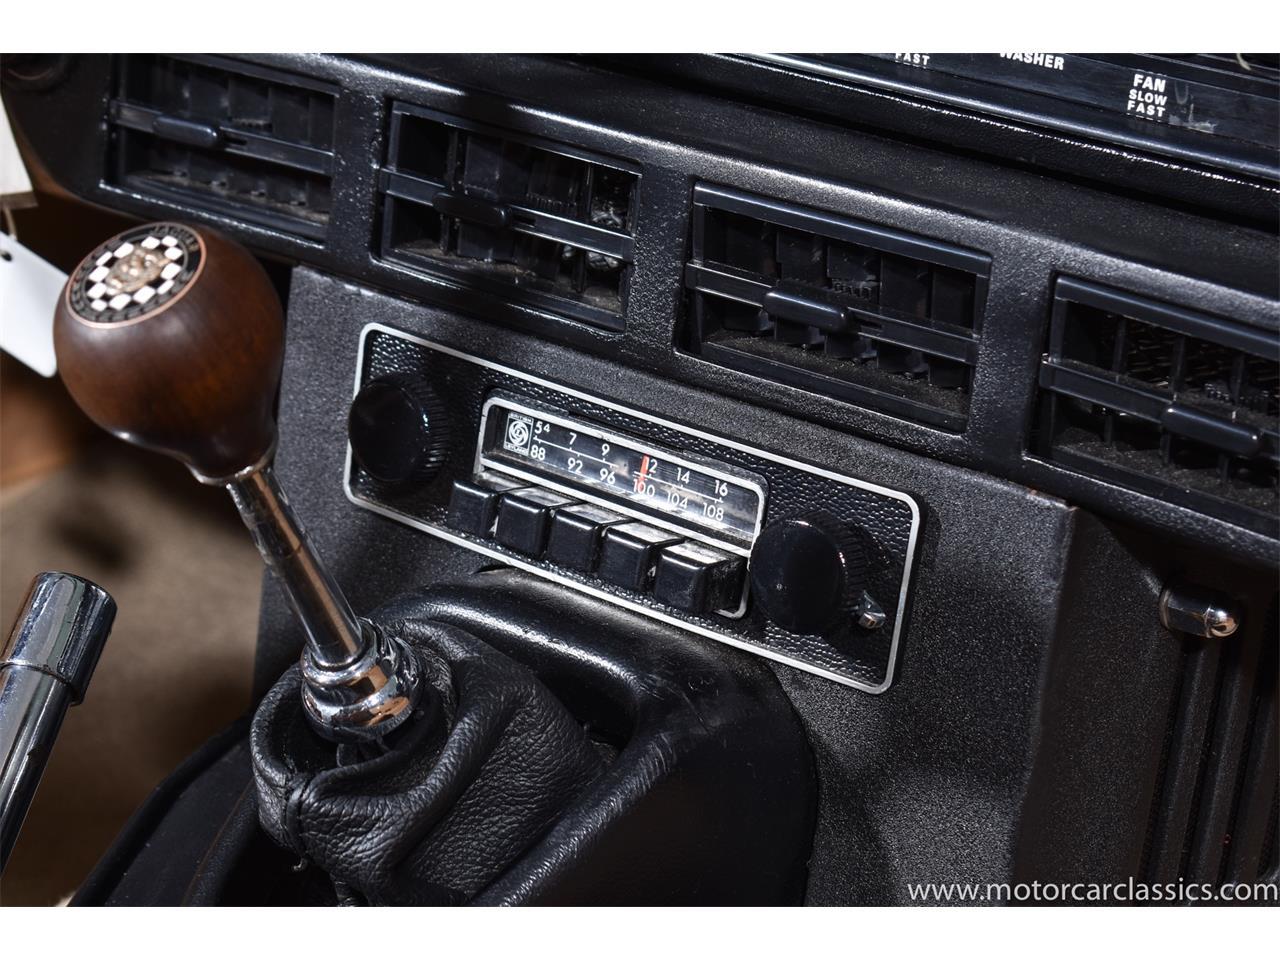 1974 Jaguar E-Type (CC-1250243) for sale in Farmingdale, New York